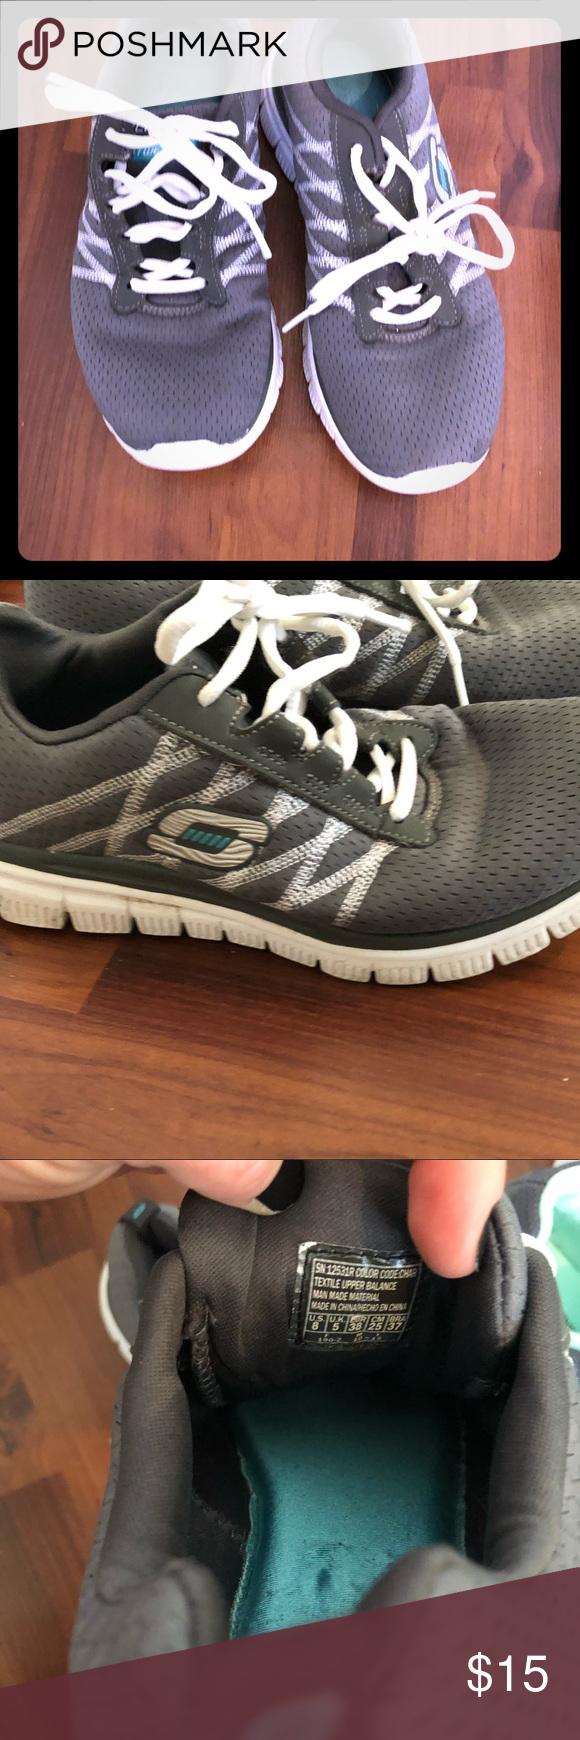 Sketcher sneakers, Sneakers, Skechers shoes